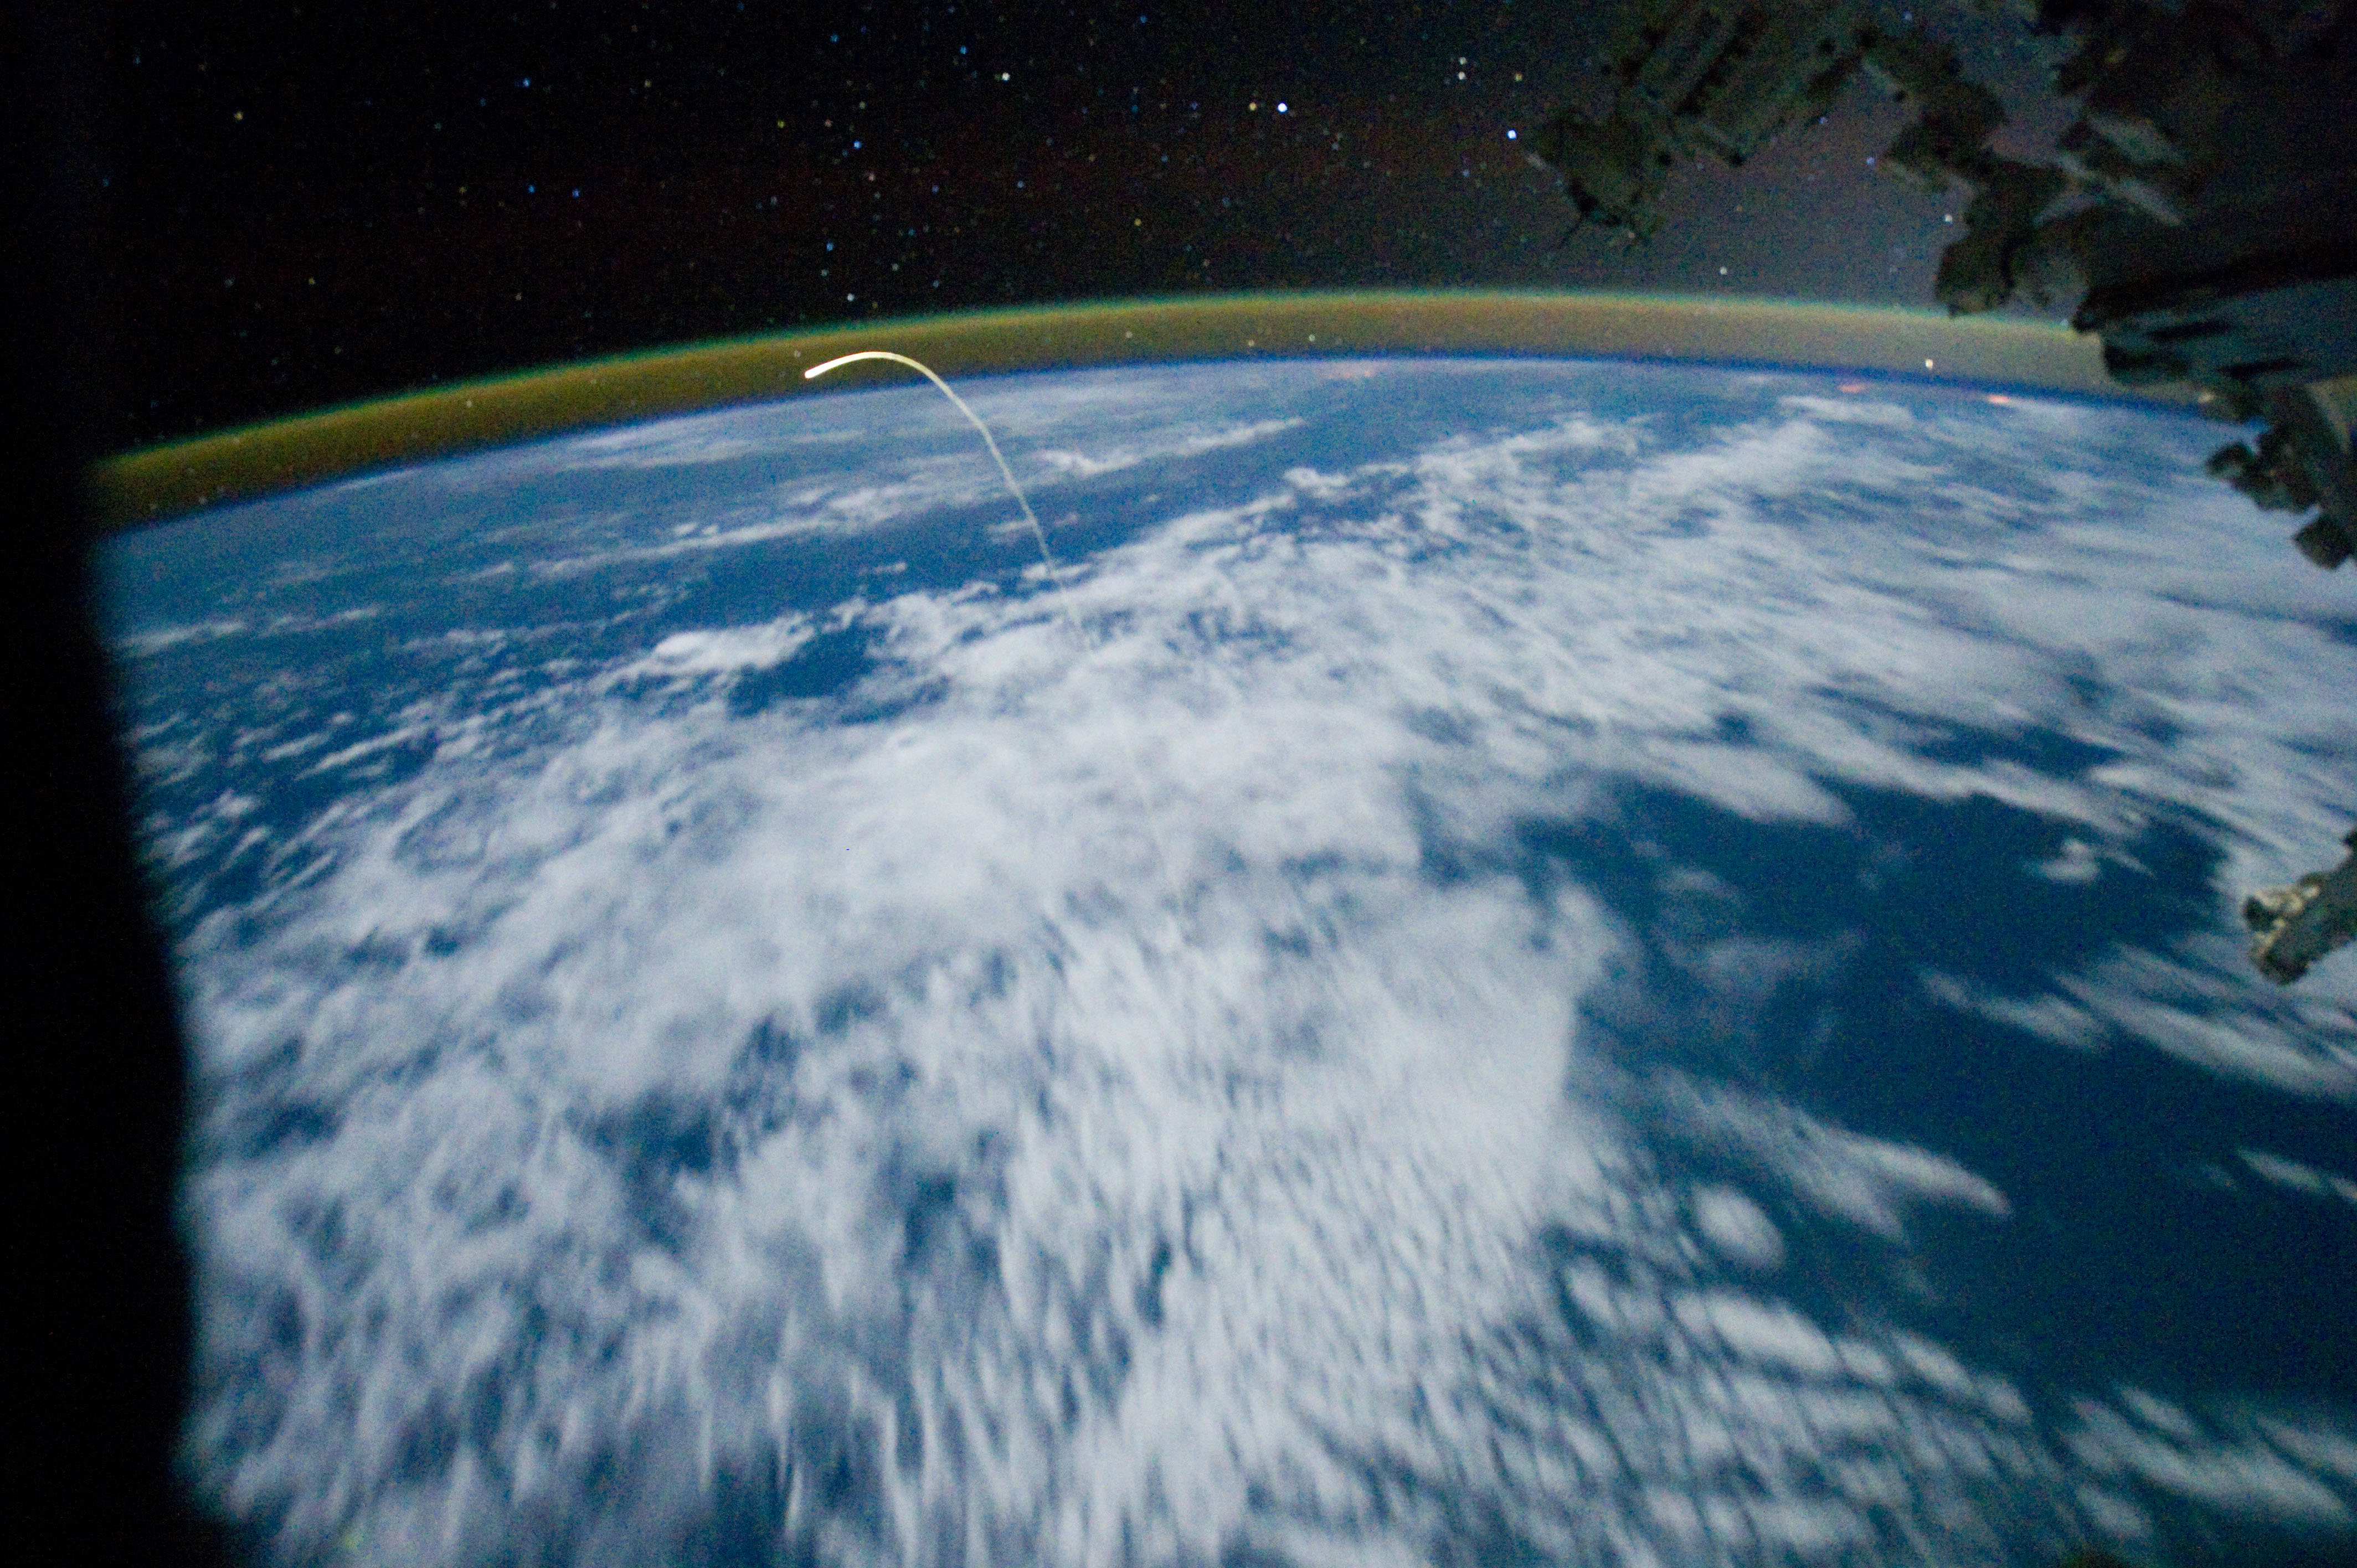 nasa space shuttle landing on earth - photo #36